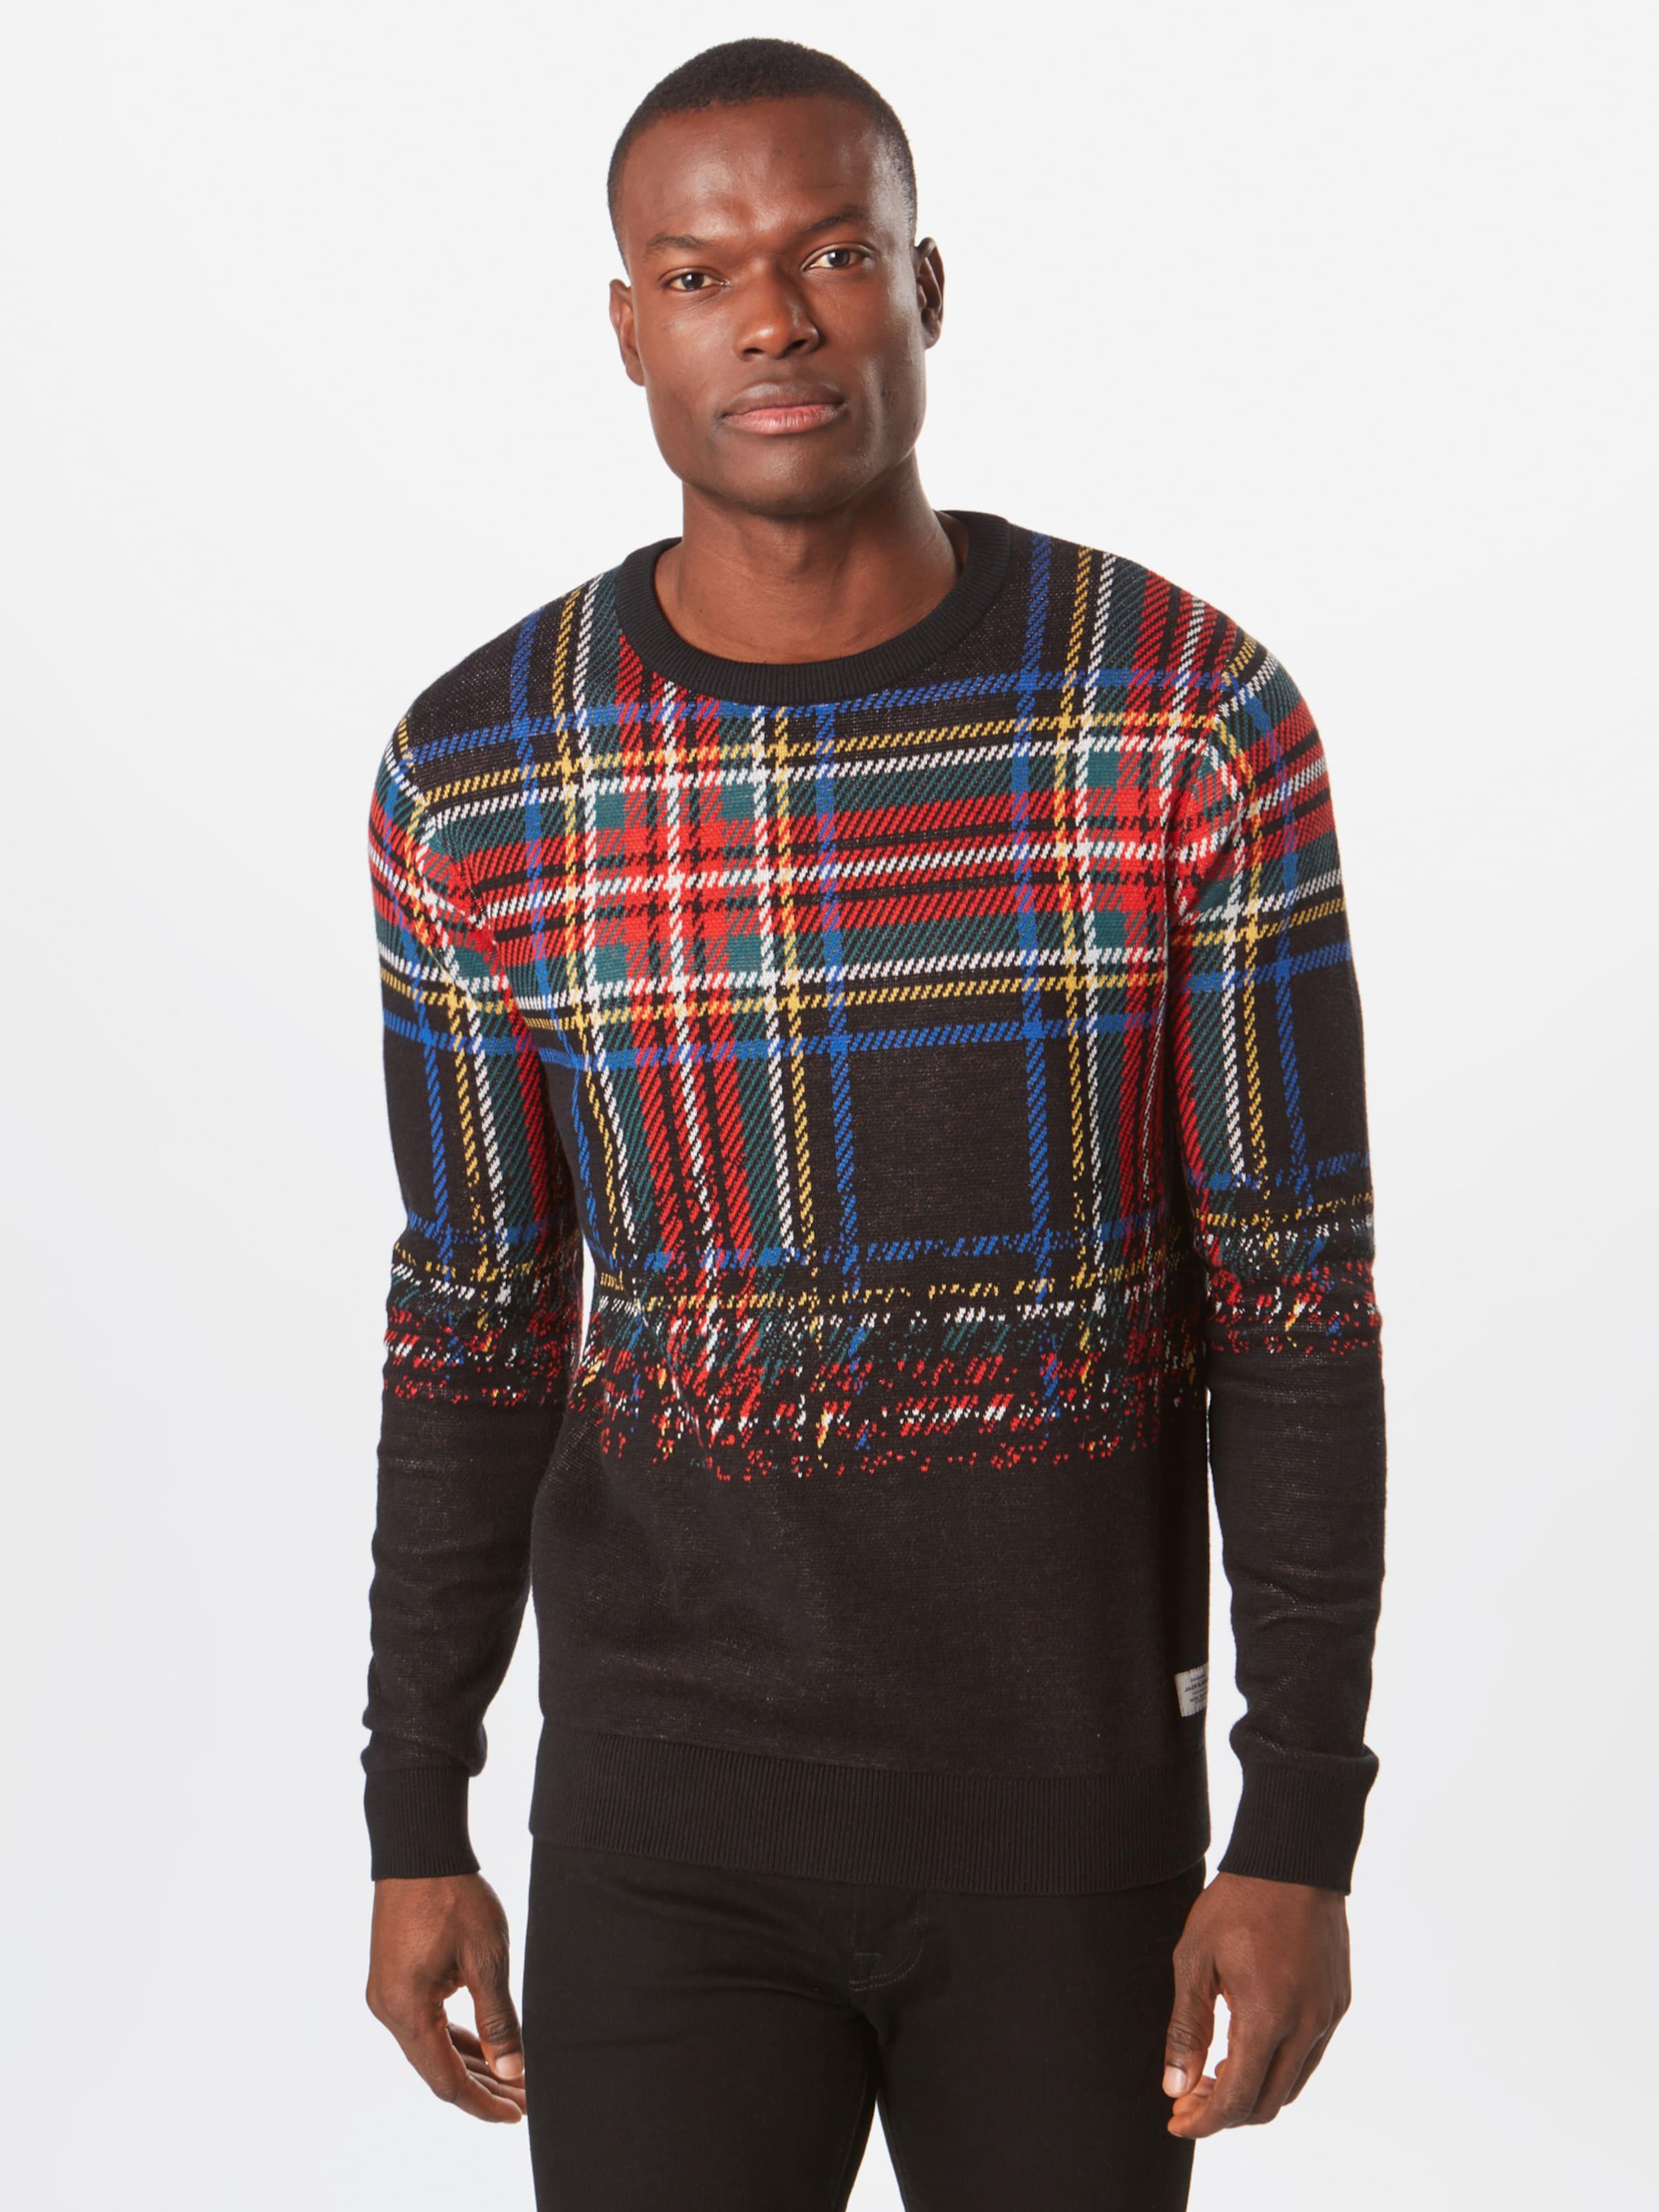 'jortate Jackamp; Neck' In BlauRot Pullover Crew Knit Jones 0PnX8kwO